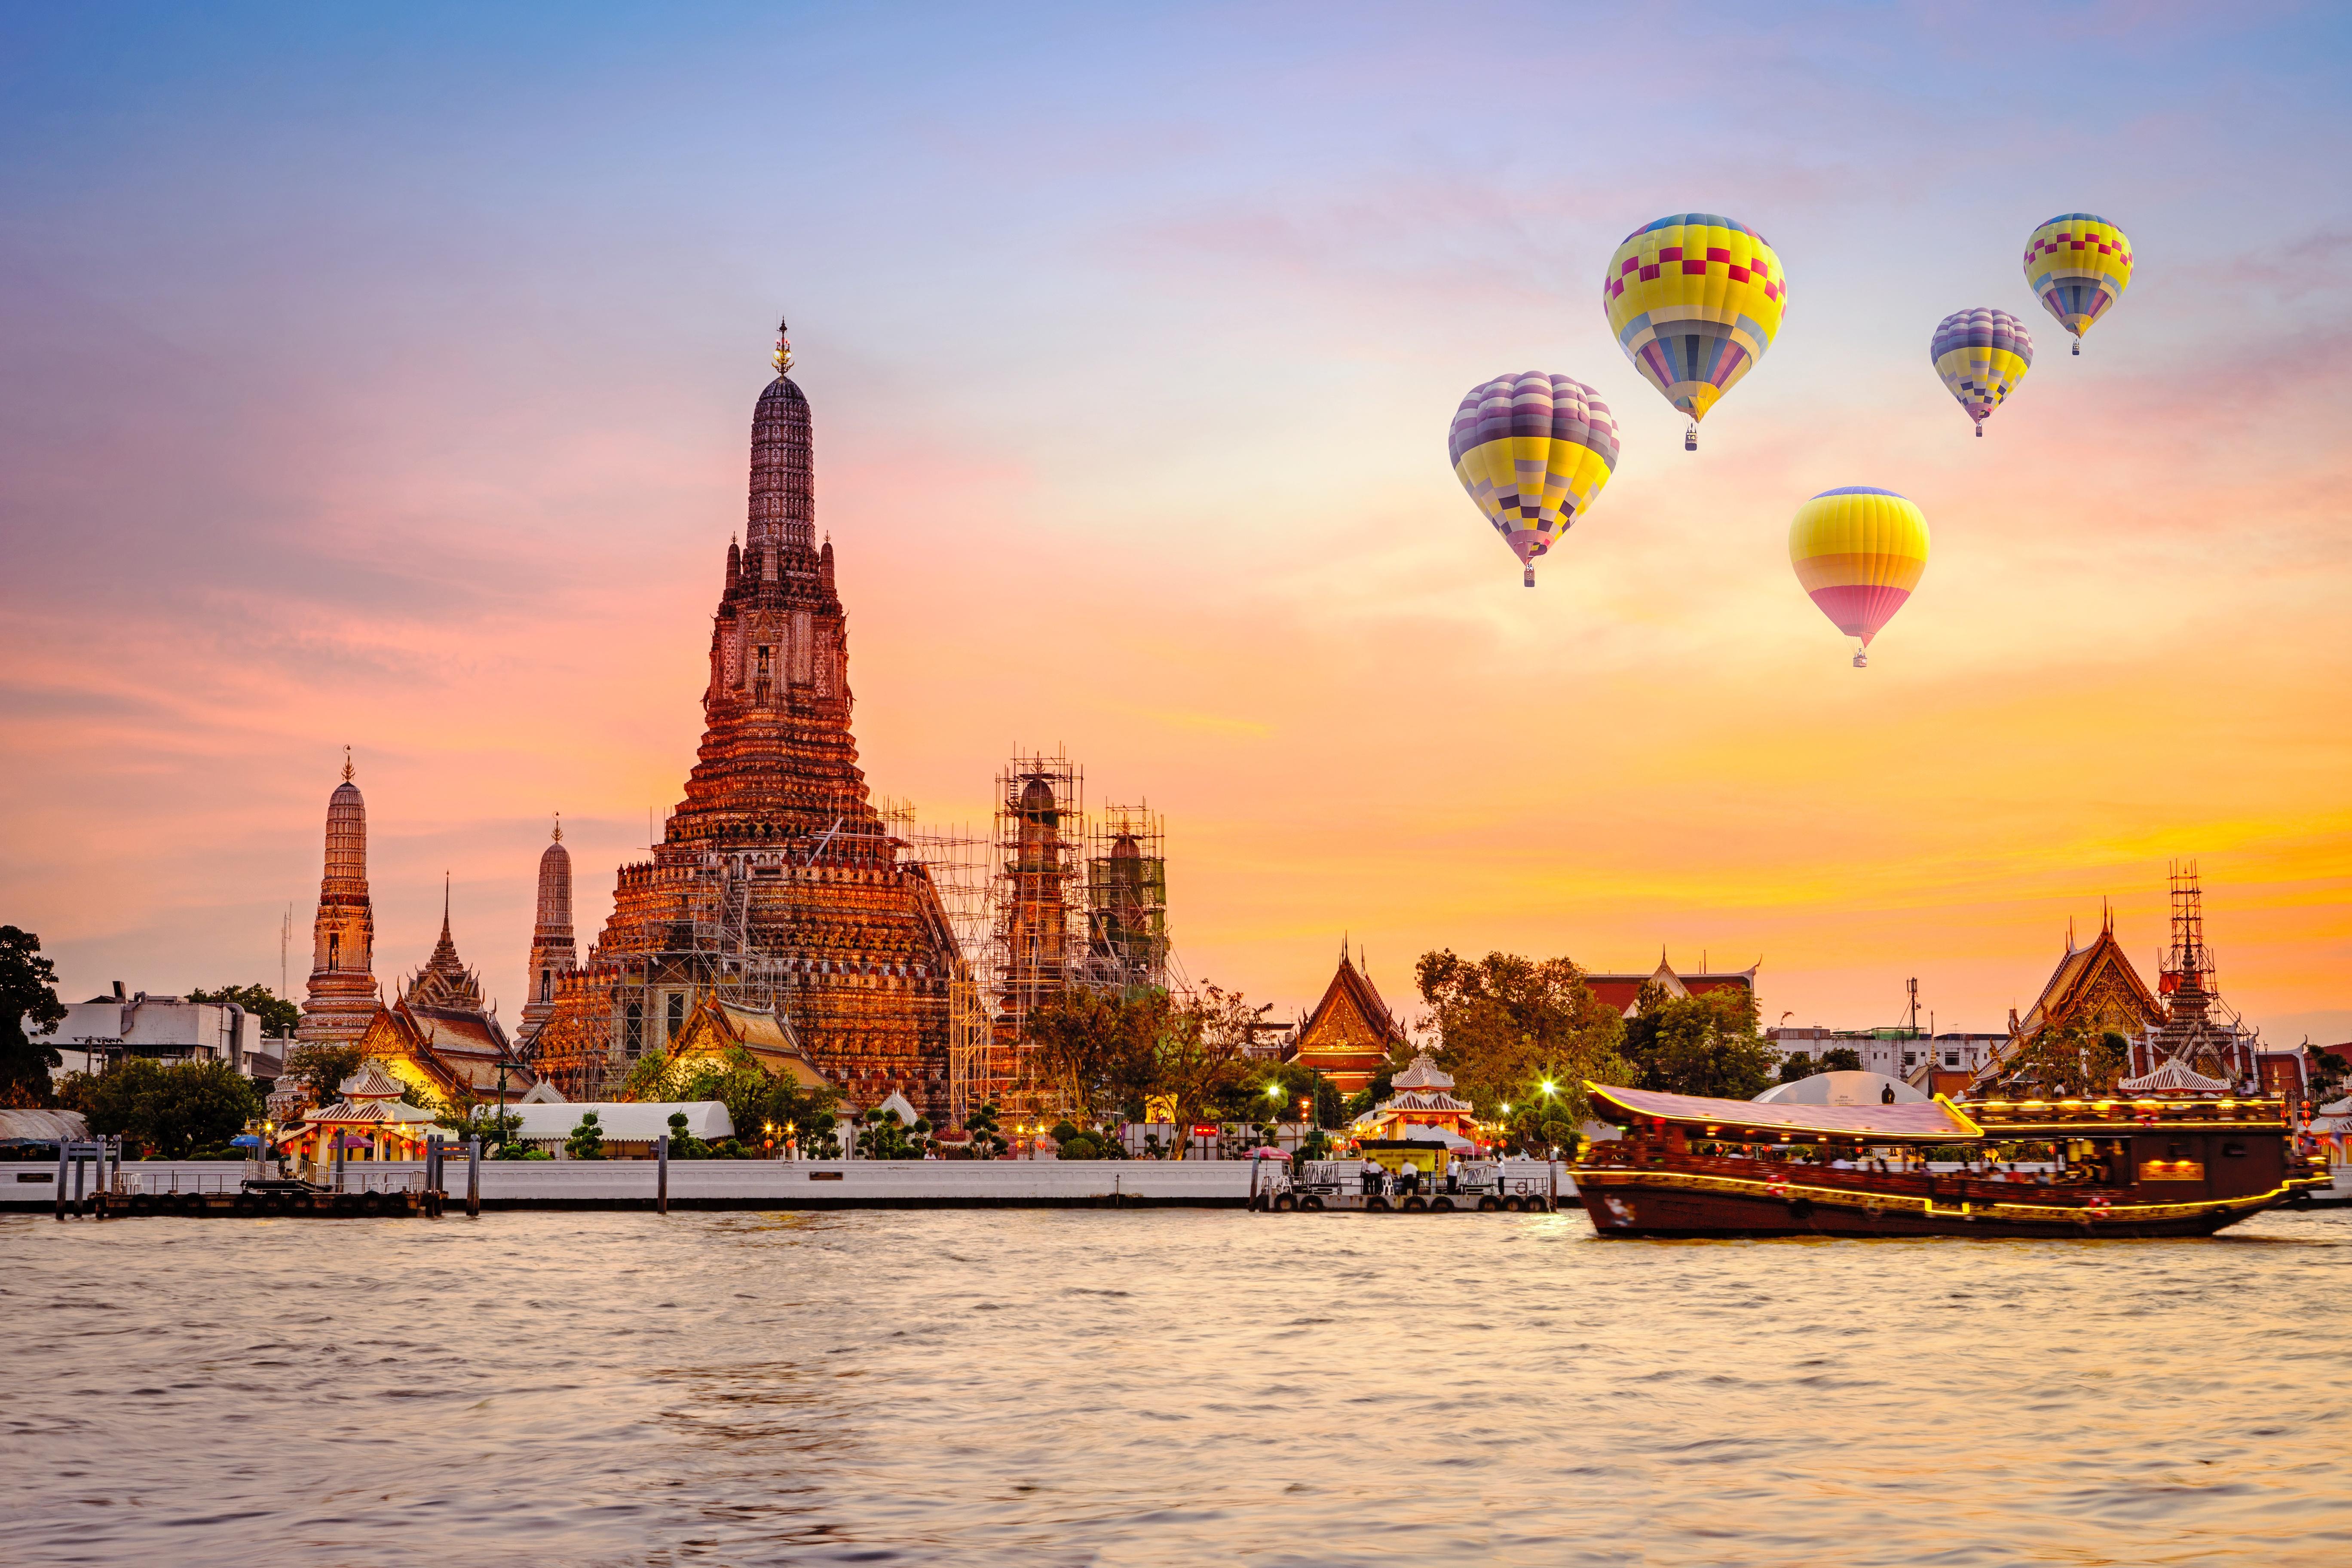 Thailand_Bangkok_Wat_arun_shutterstock_419718022